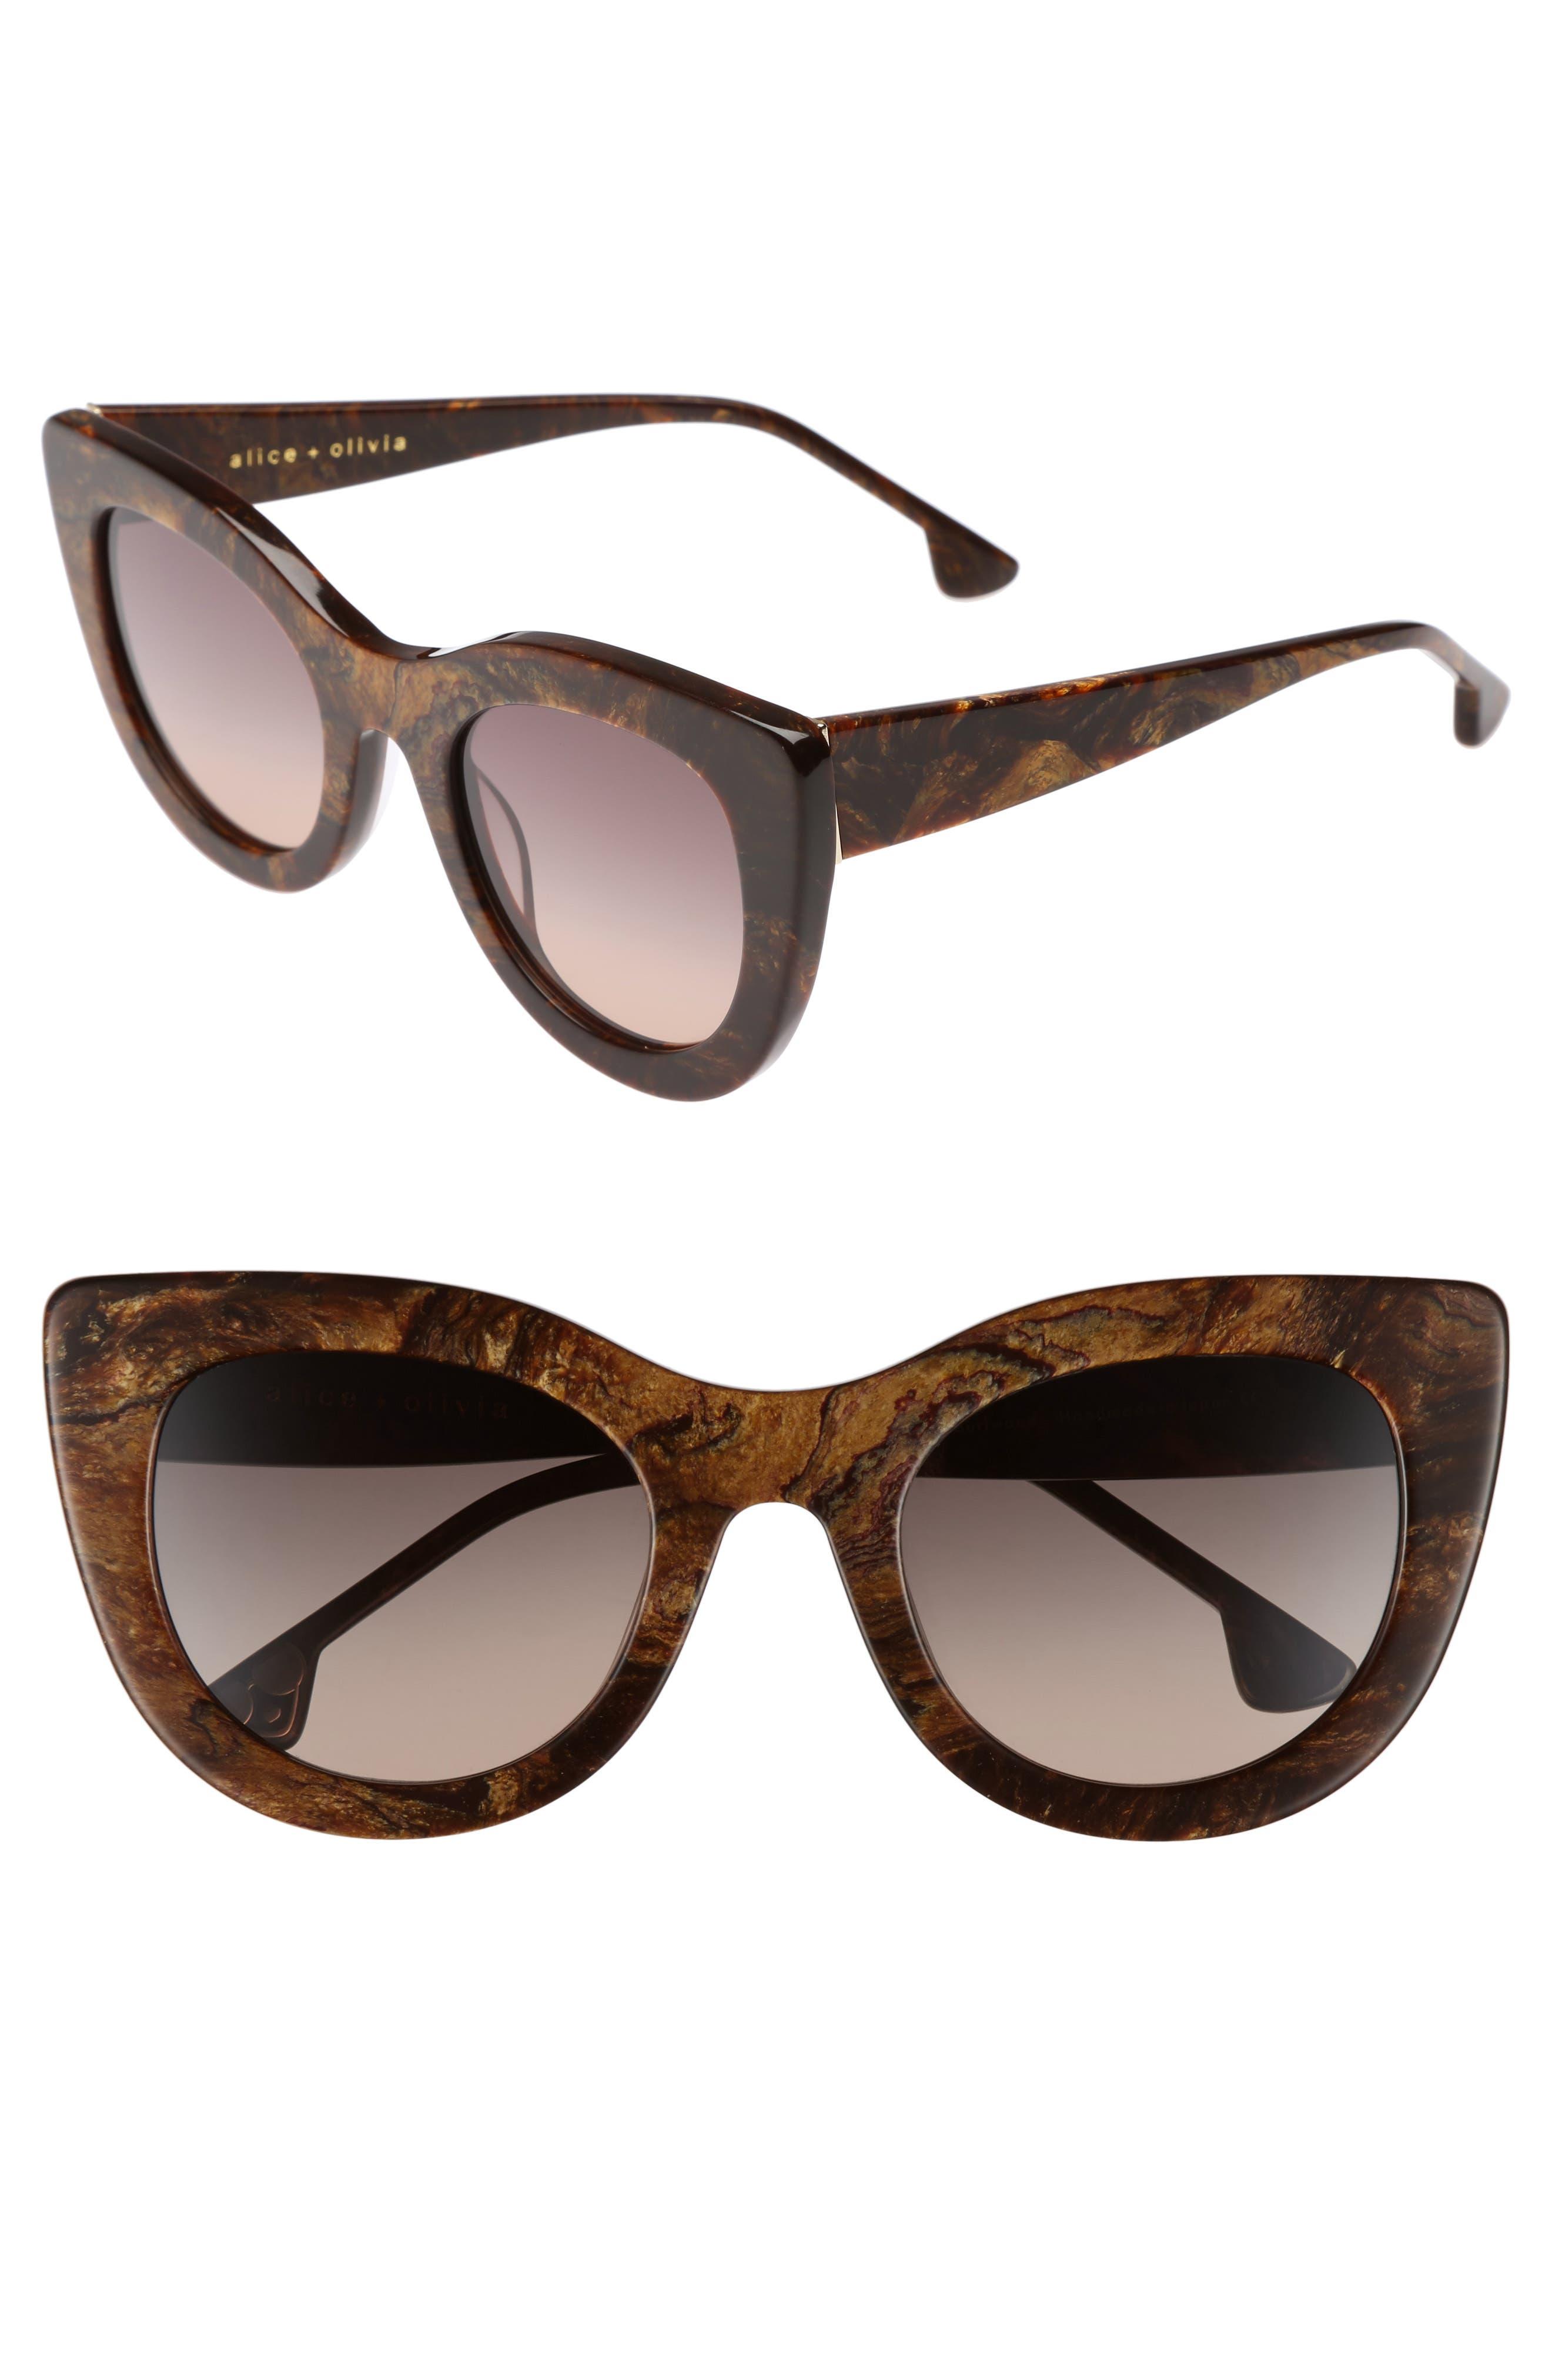 Alternate Image 1 Selected - Alice + Olivia Delancey 51mm Cat Eye Sunglasses